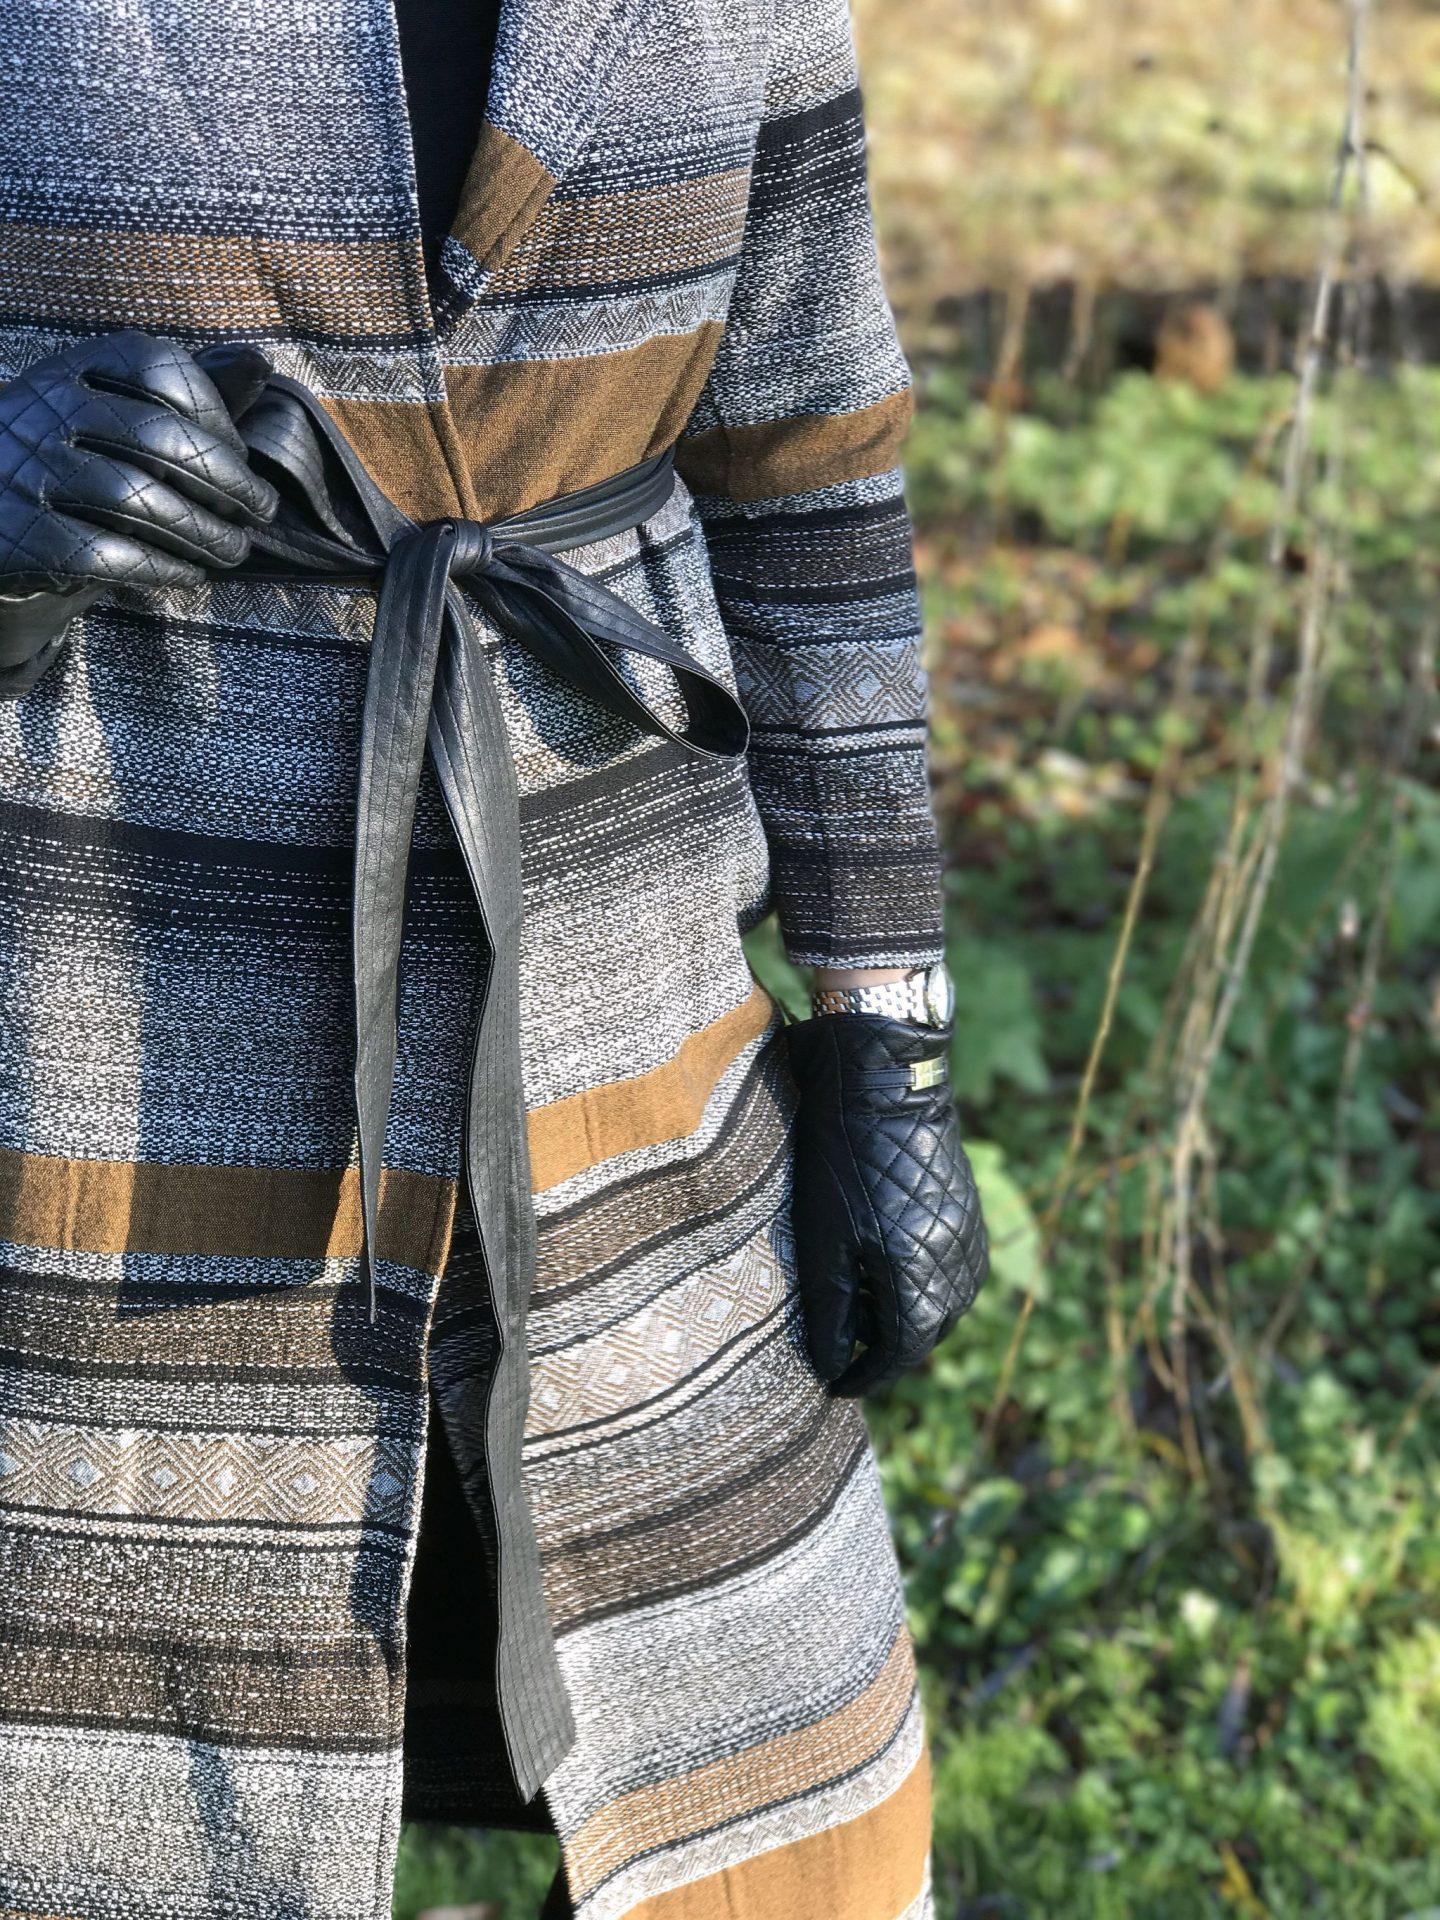 Statement Mac – Not an ordinary Coat